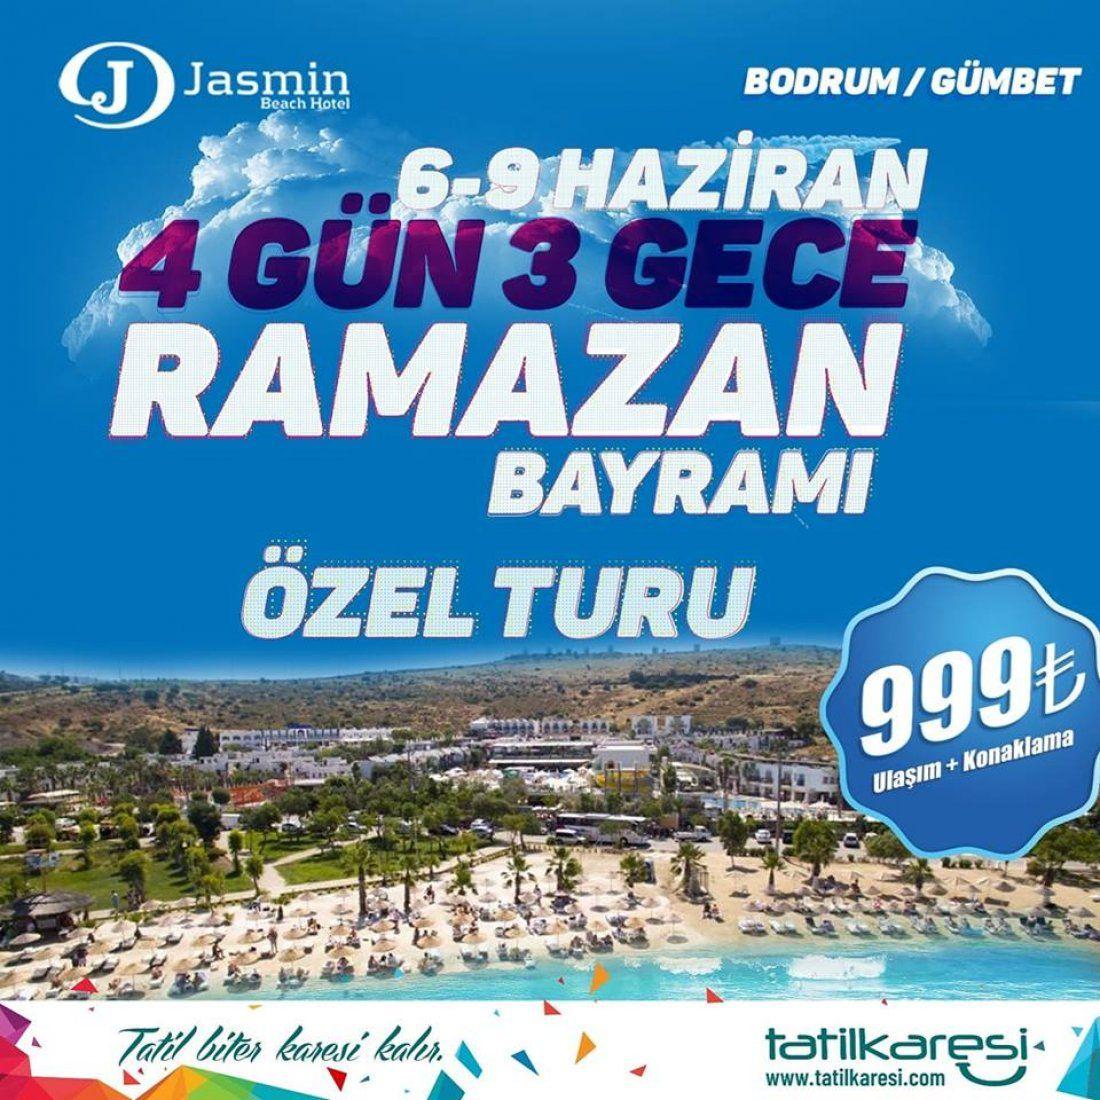 Ramazan Bayram Bodrum Turu 2019